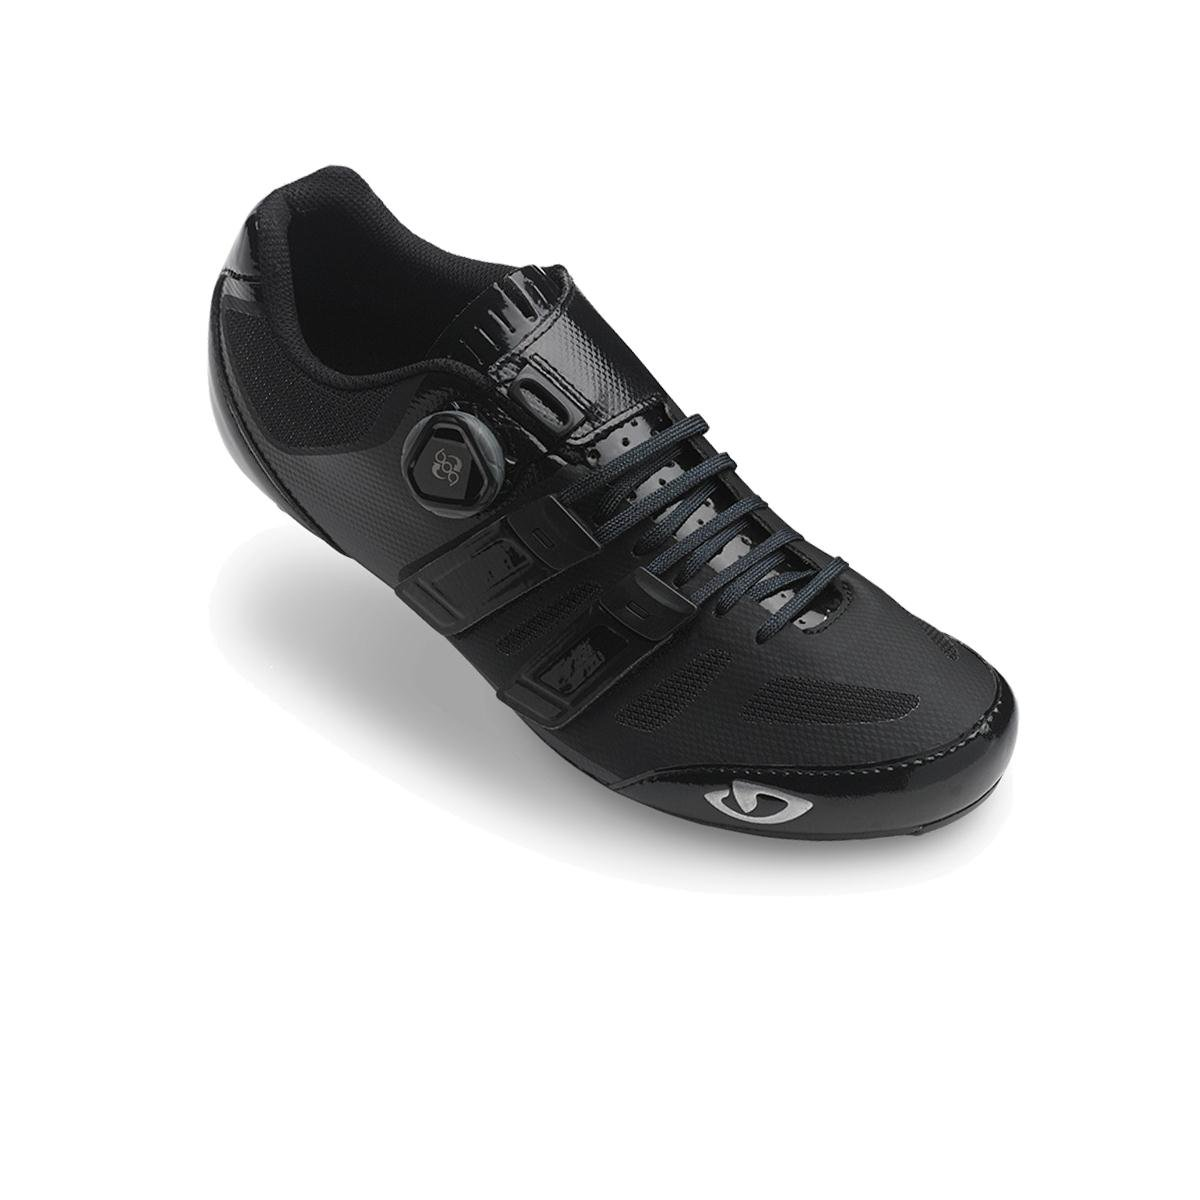 Giro Sentrie Techlace Road Cycling Shoes B01LWID7EB 46 Black